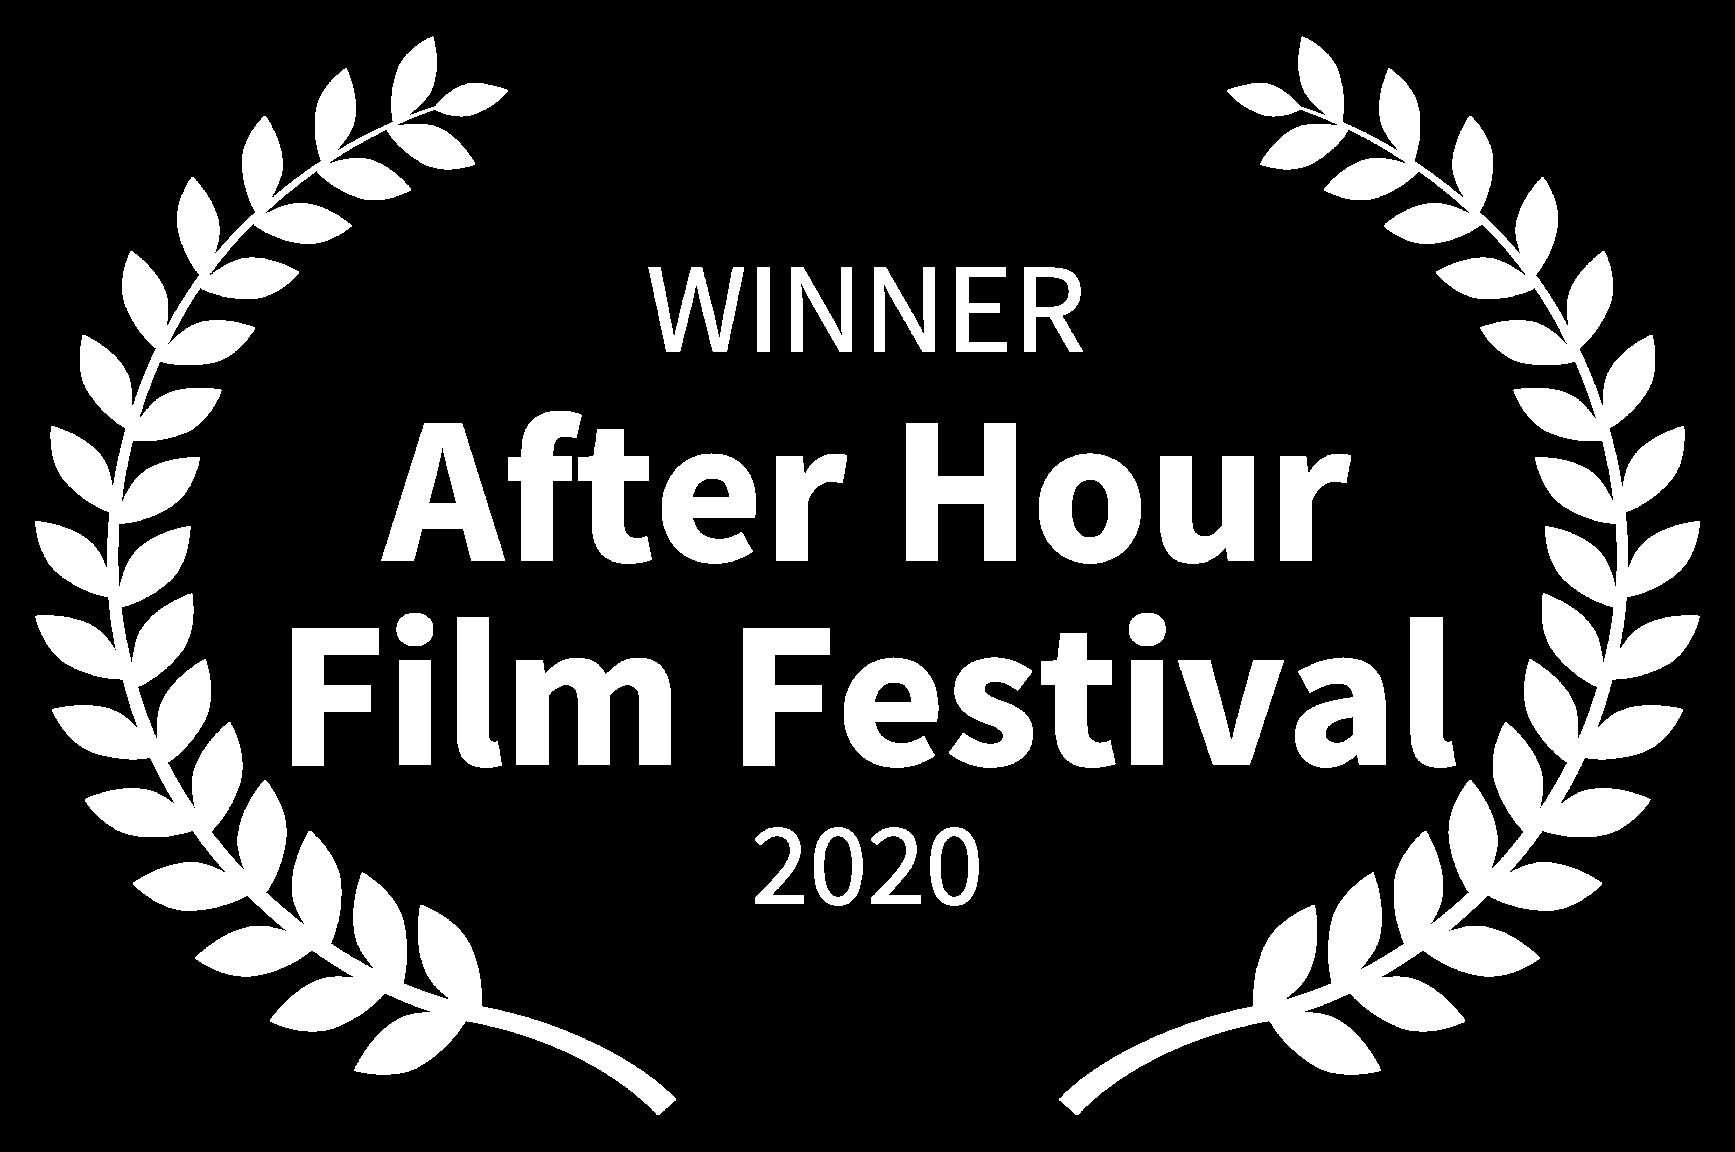 WINNER - After Hour Film Festival - 2020